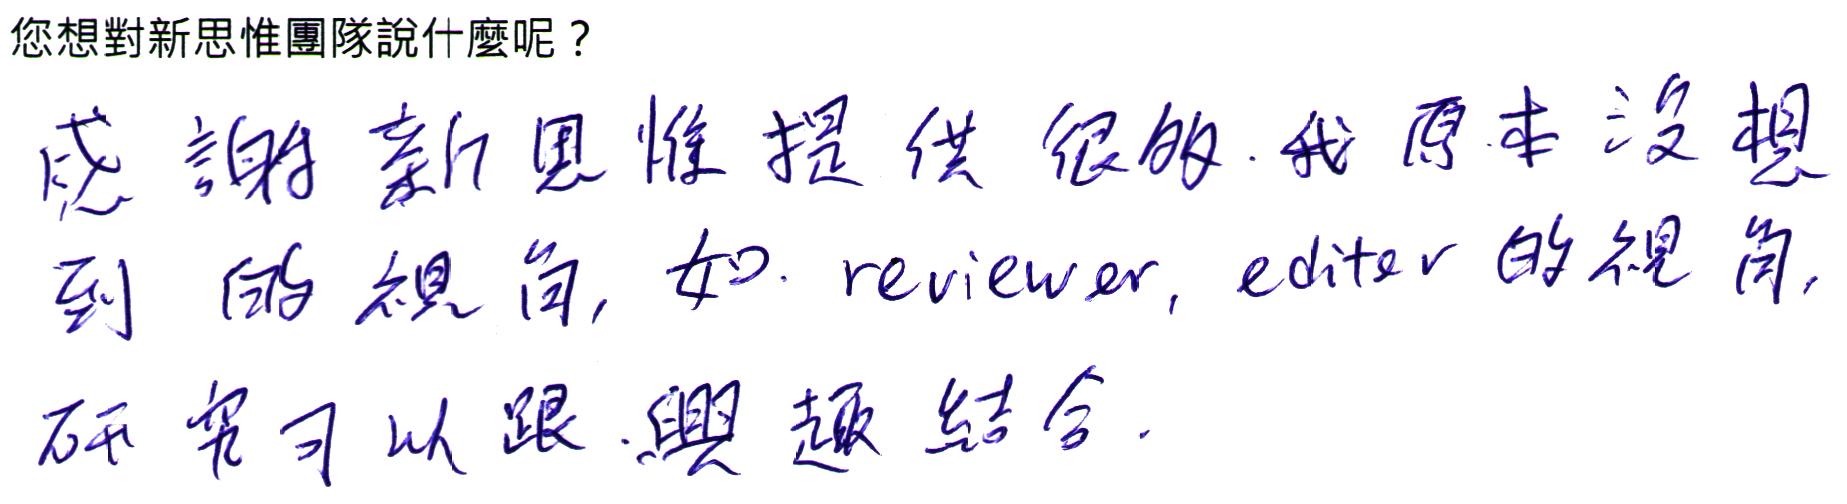 20170924_YMRF_feedback_00029